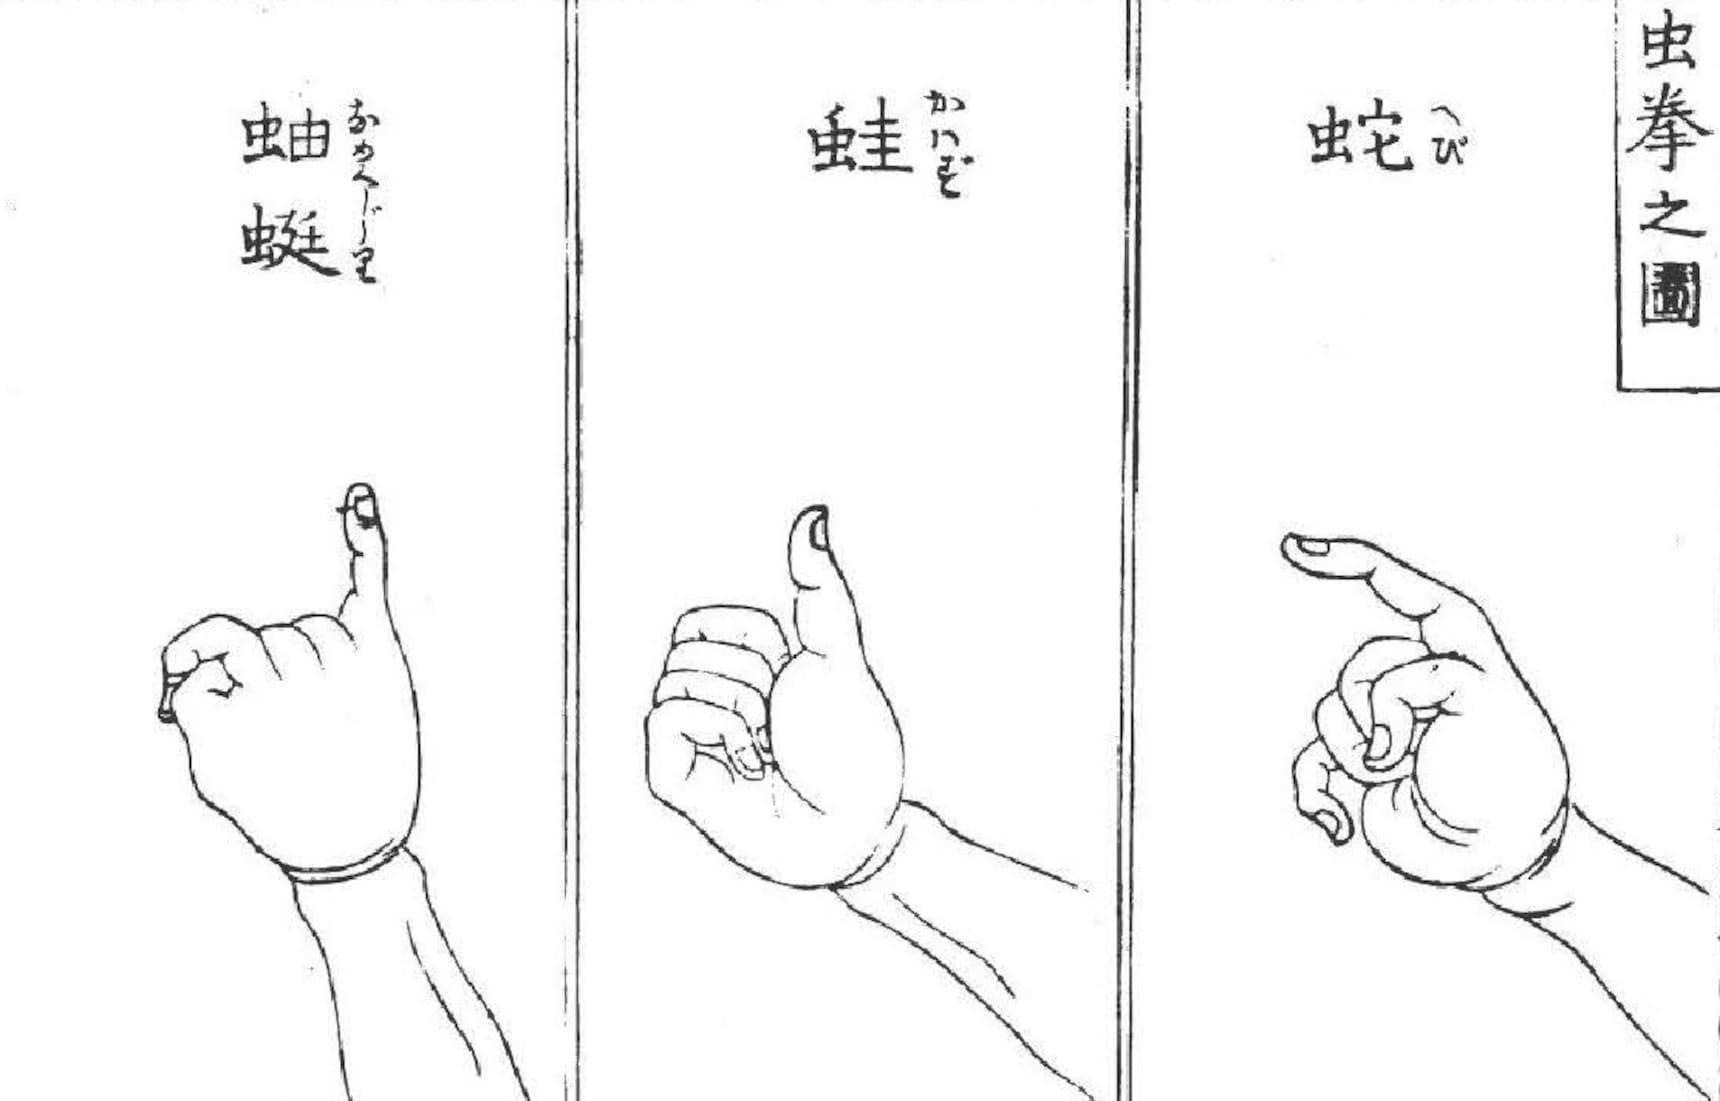 The History Behind Japan's 'Janken' Game